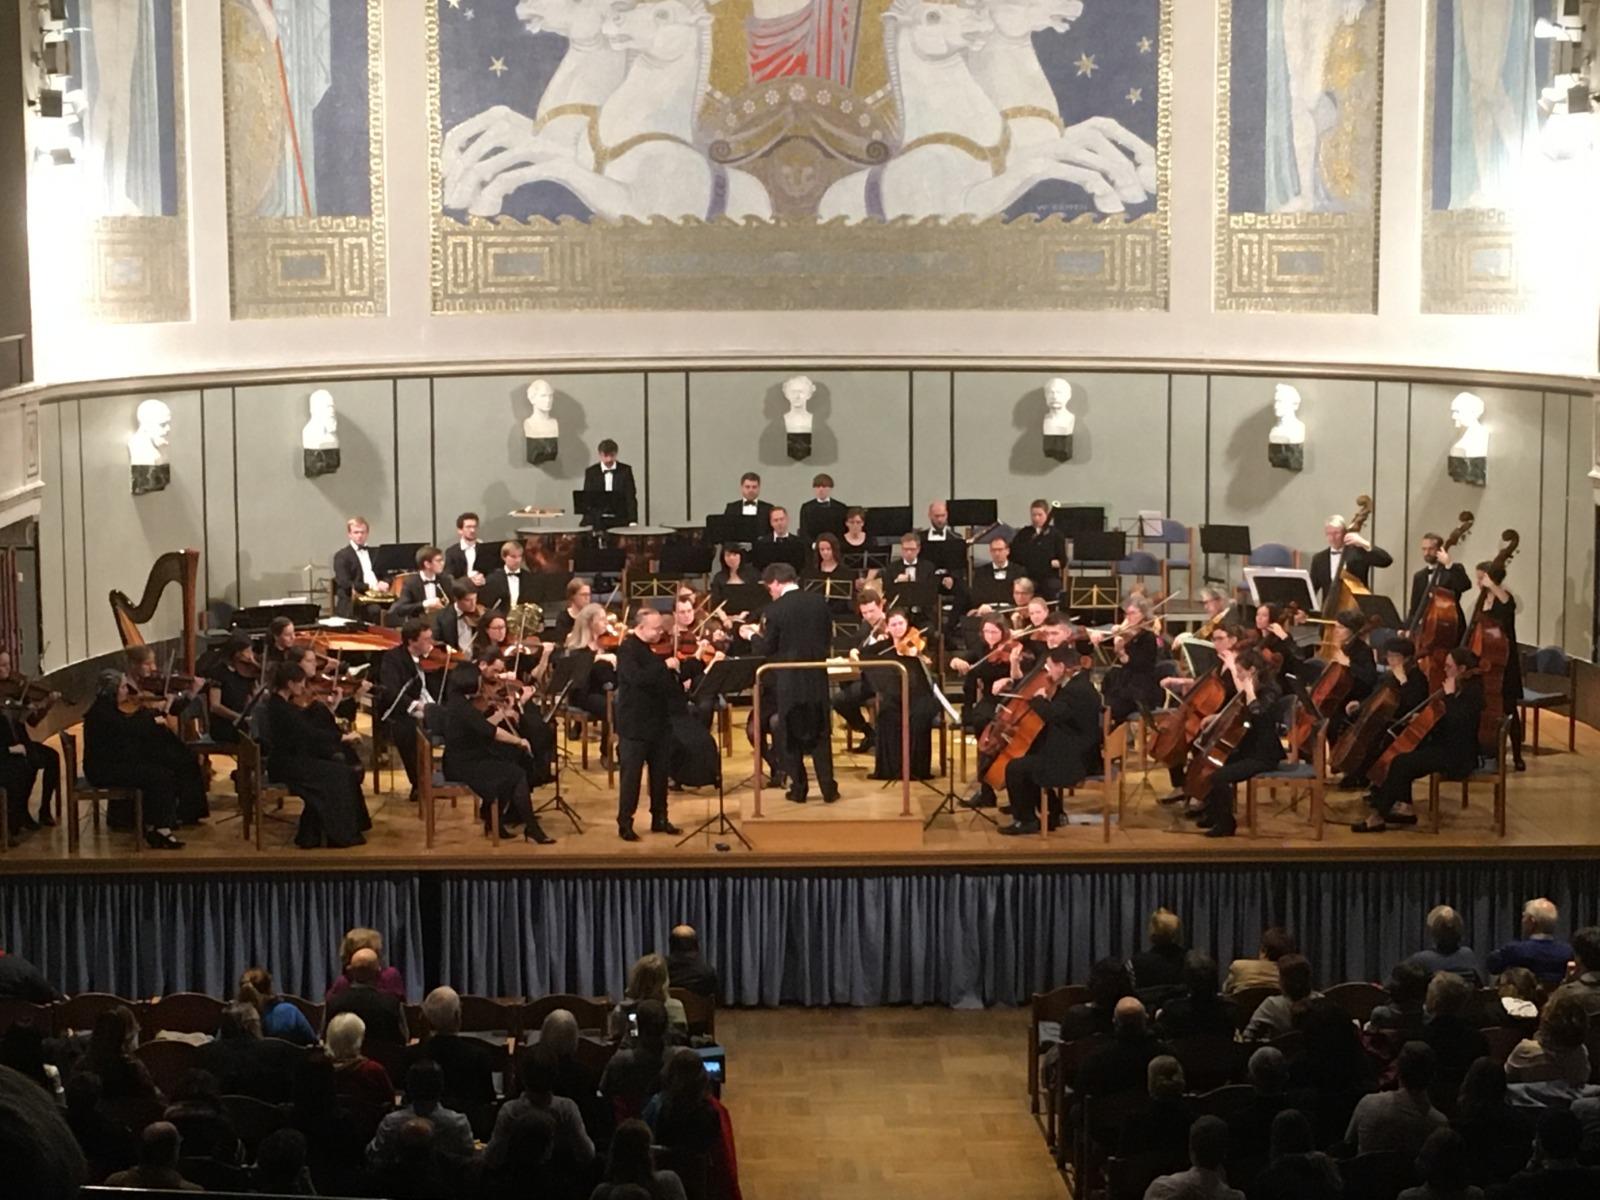 20200215 Violin Concerto, Große Aula der LMU, Munich